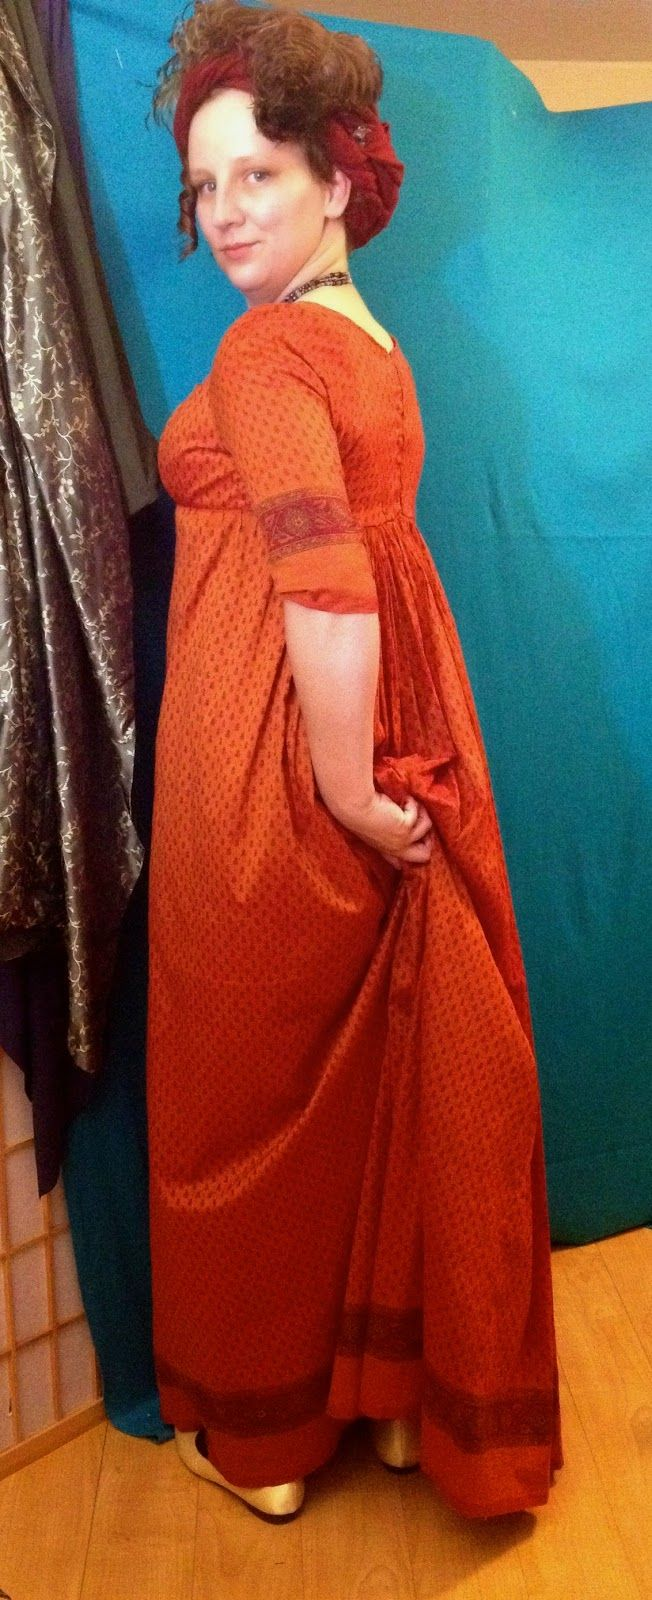 The Laced Angel: Orange Regency Sari Gown